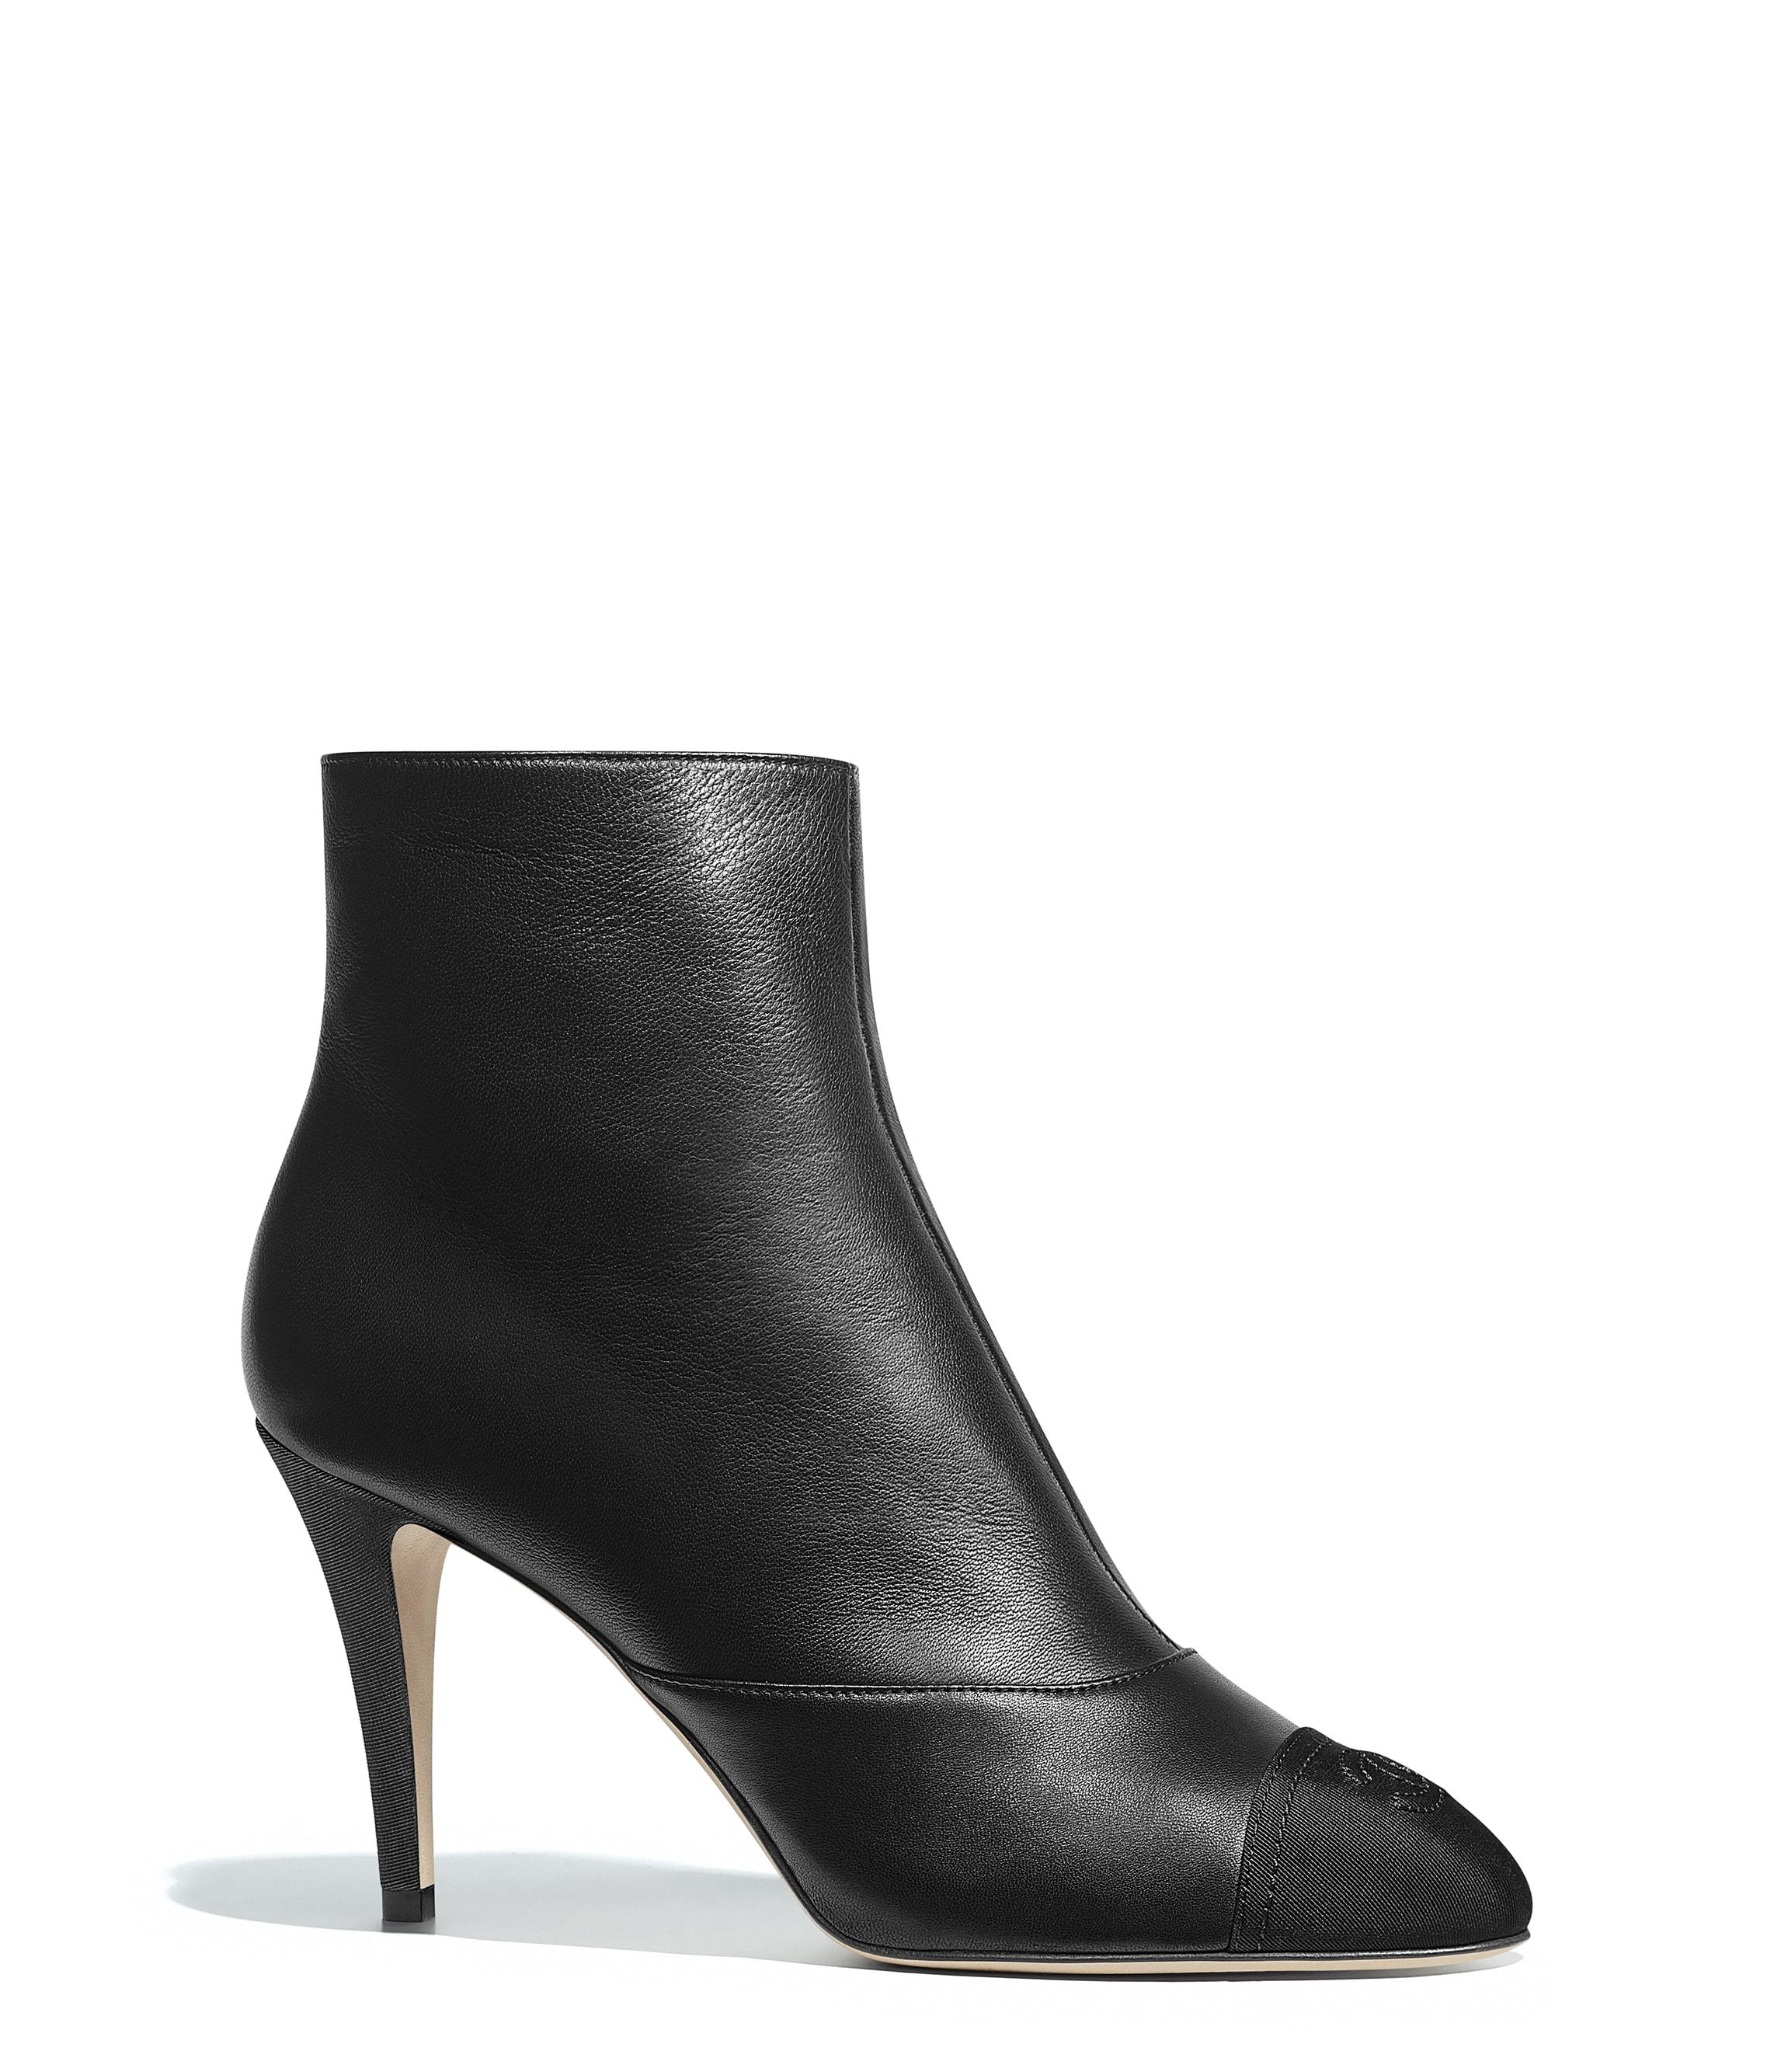 Womens fashion shoes online uk 1